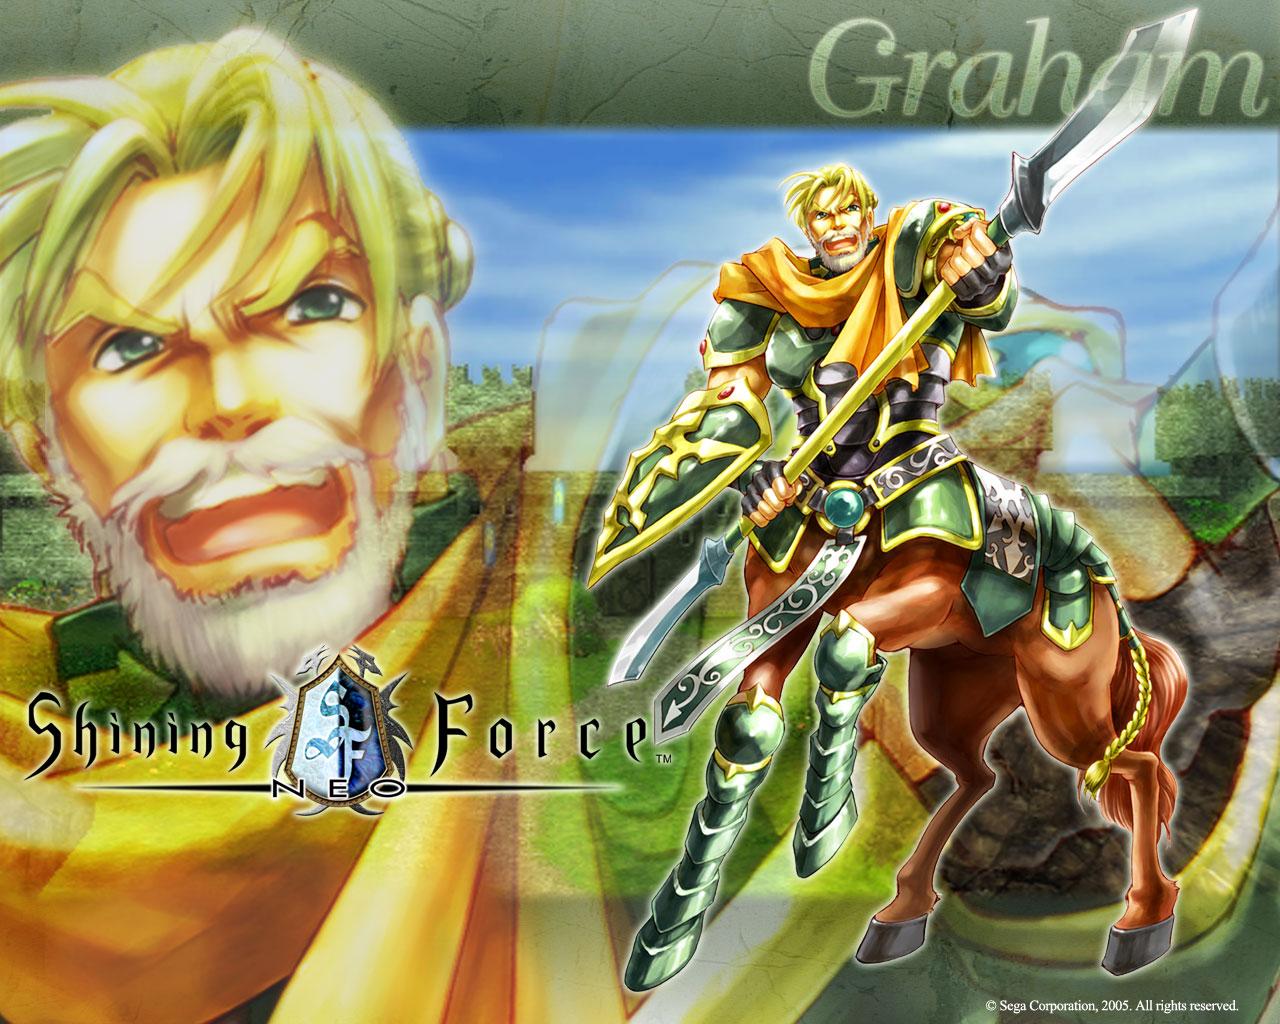 Graham (Shining Force Neo)